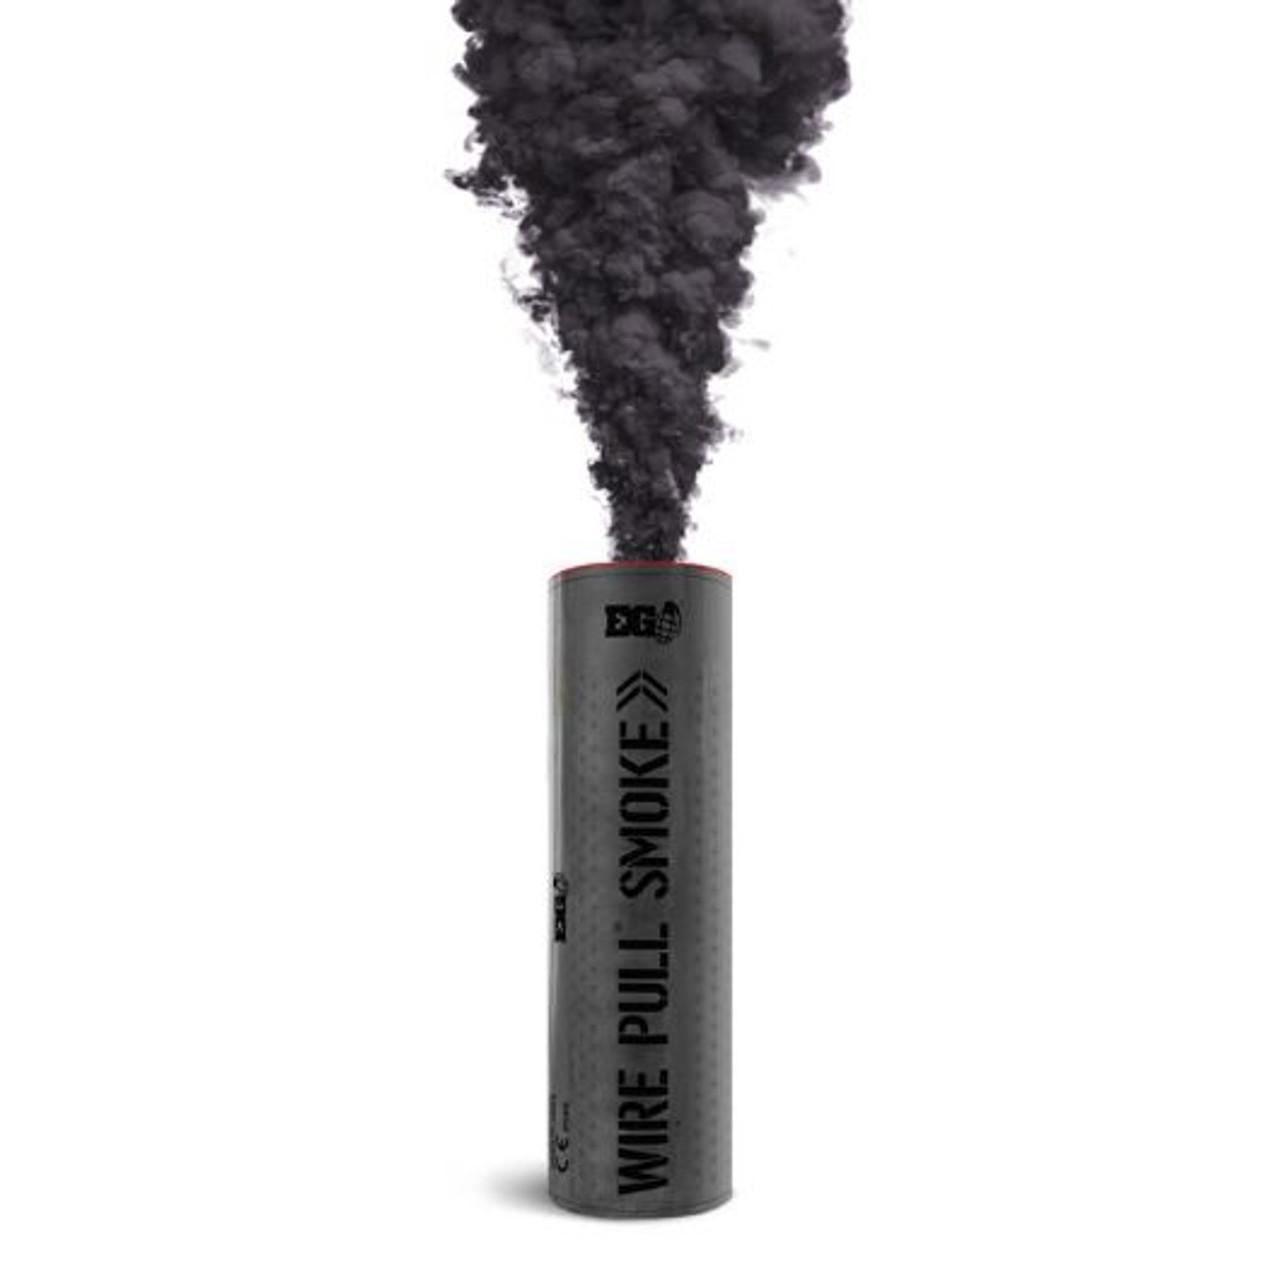 Pyro Shipped Easy Wire Pull Smoke Grenade black